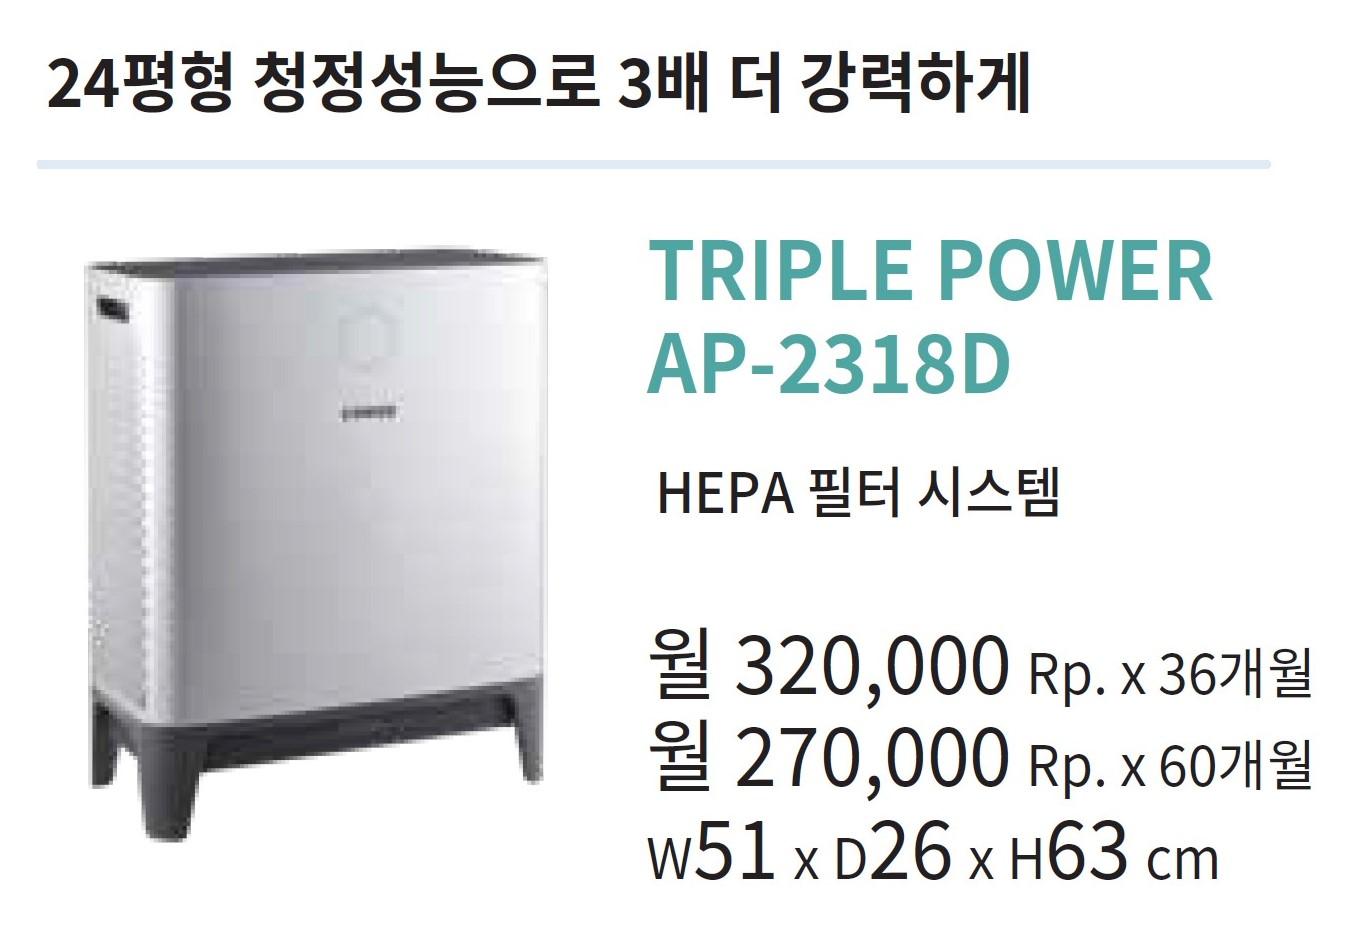 7-TRIPUL POWER